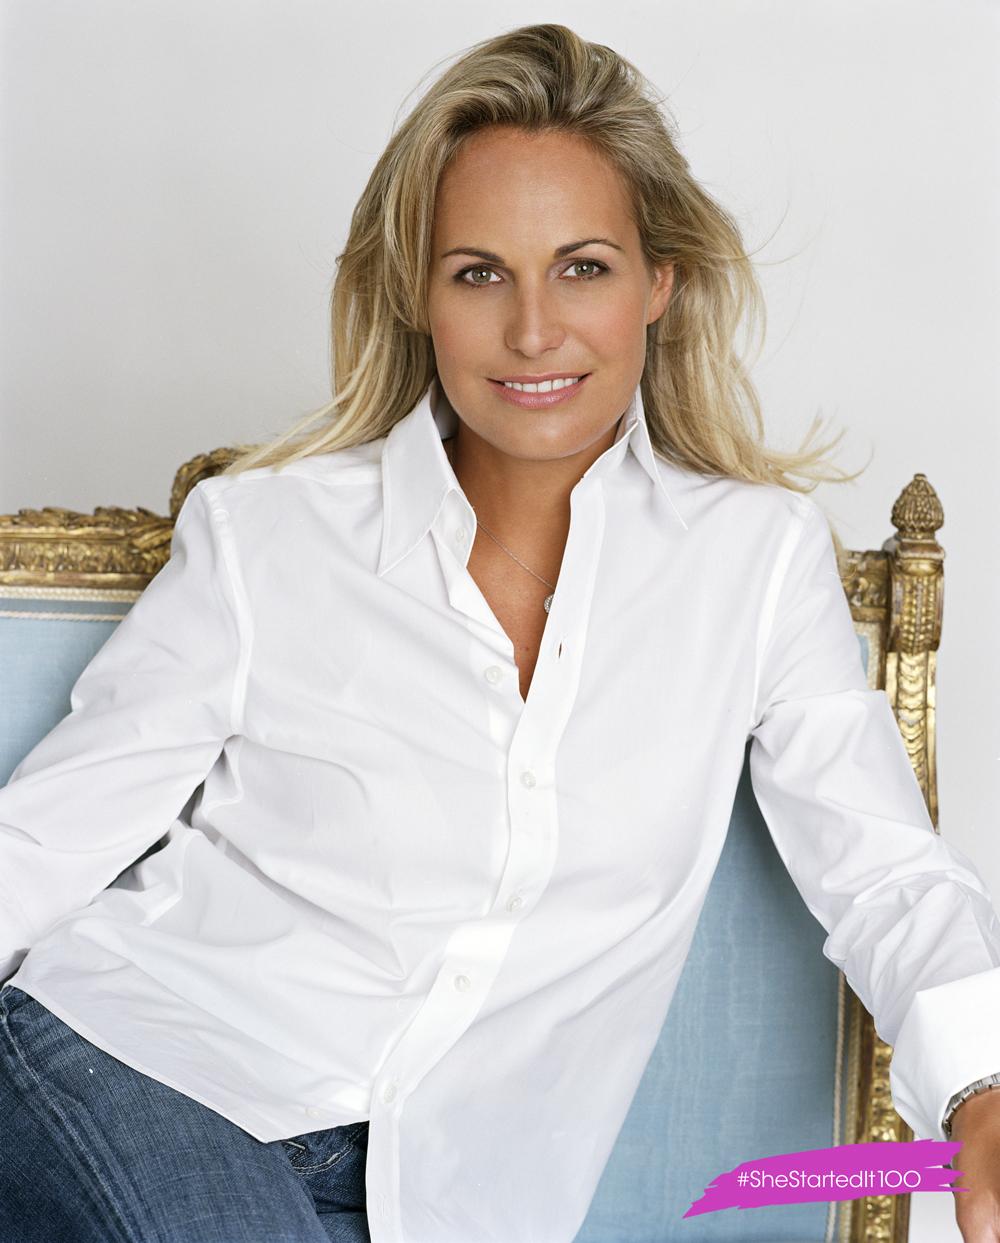 Female Entrepreneurs to Watch 2019